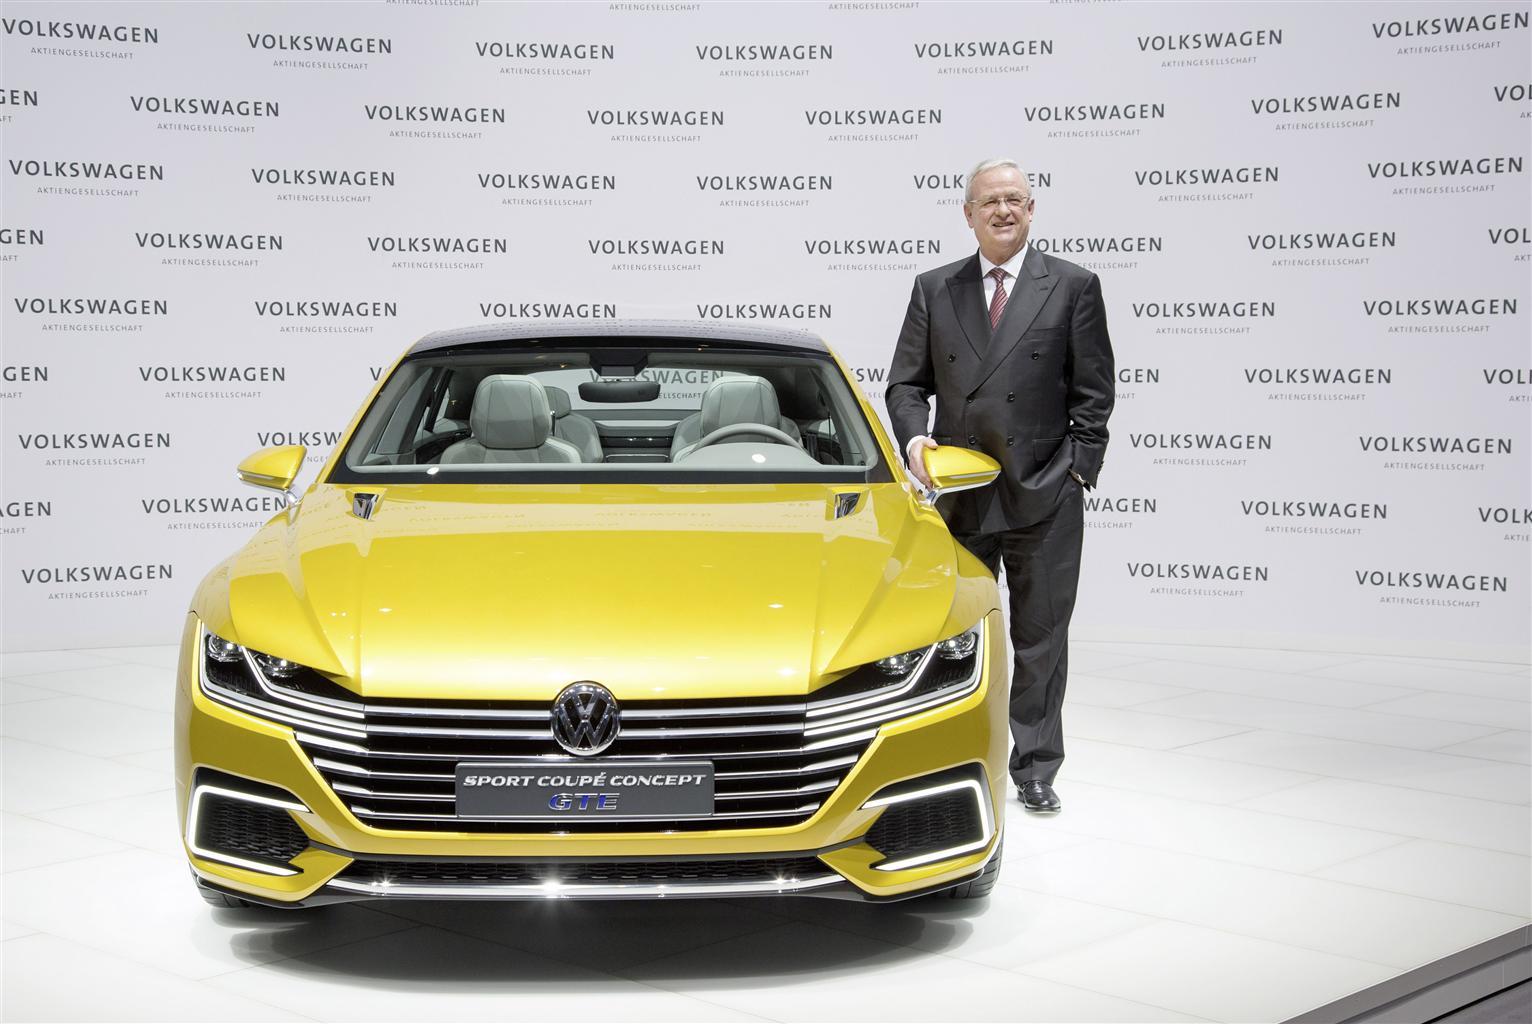 Volkswagen: 11 milioni i veicoli coinvolti